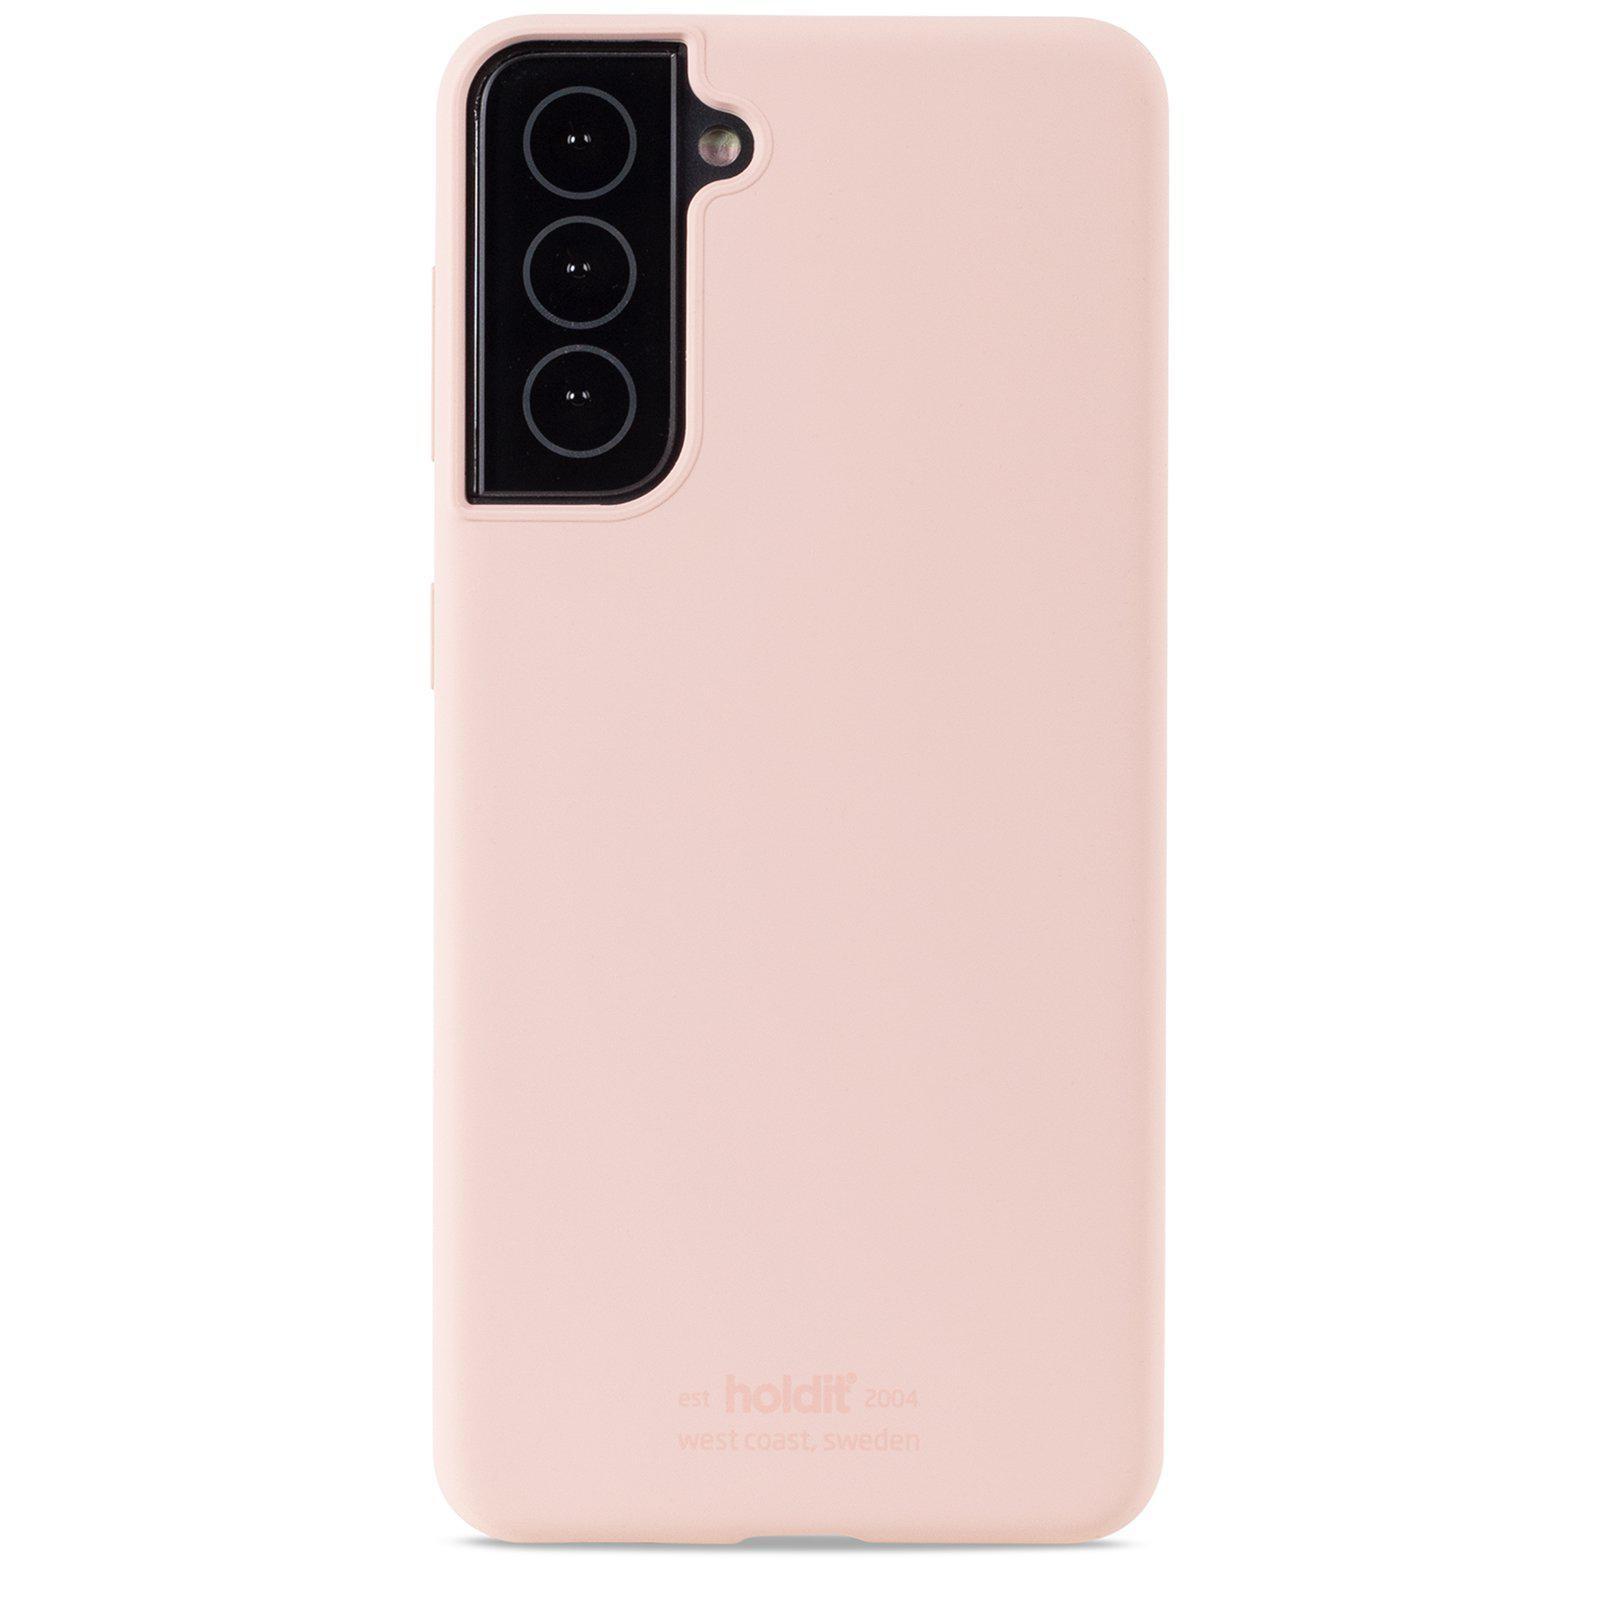 Silikonskal Samsung Galaxy S21 Blush Pink